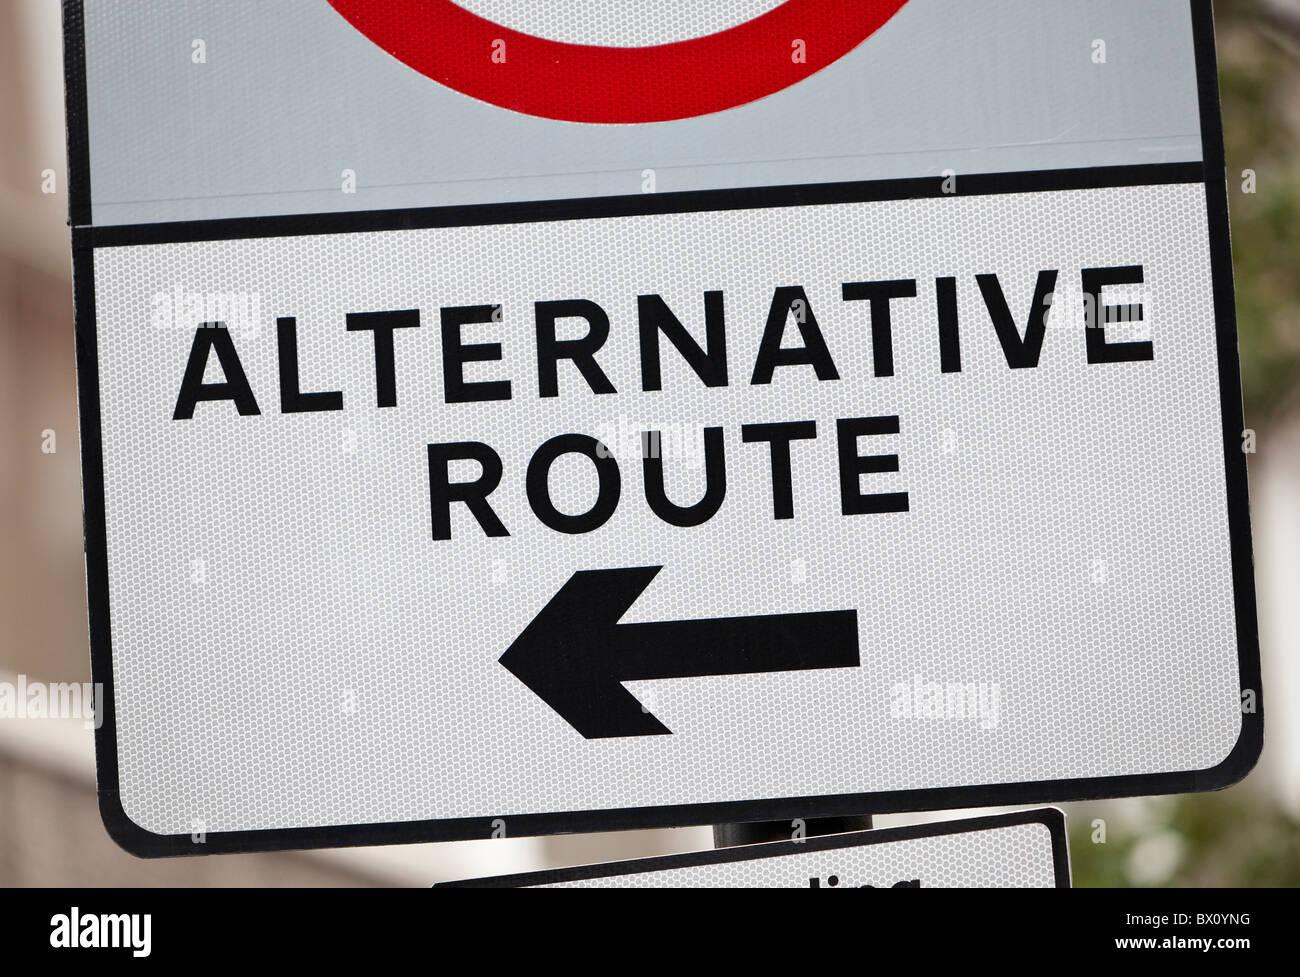 Alternative route sign, UK - Stock Image